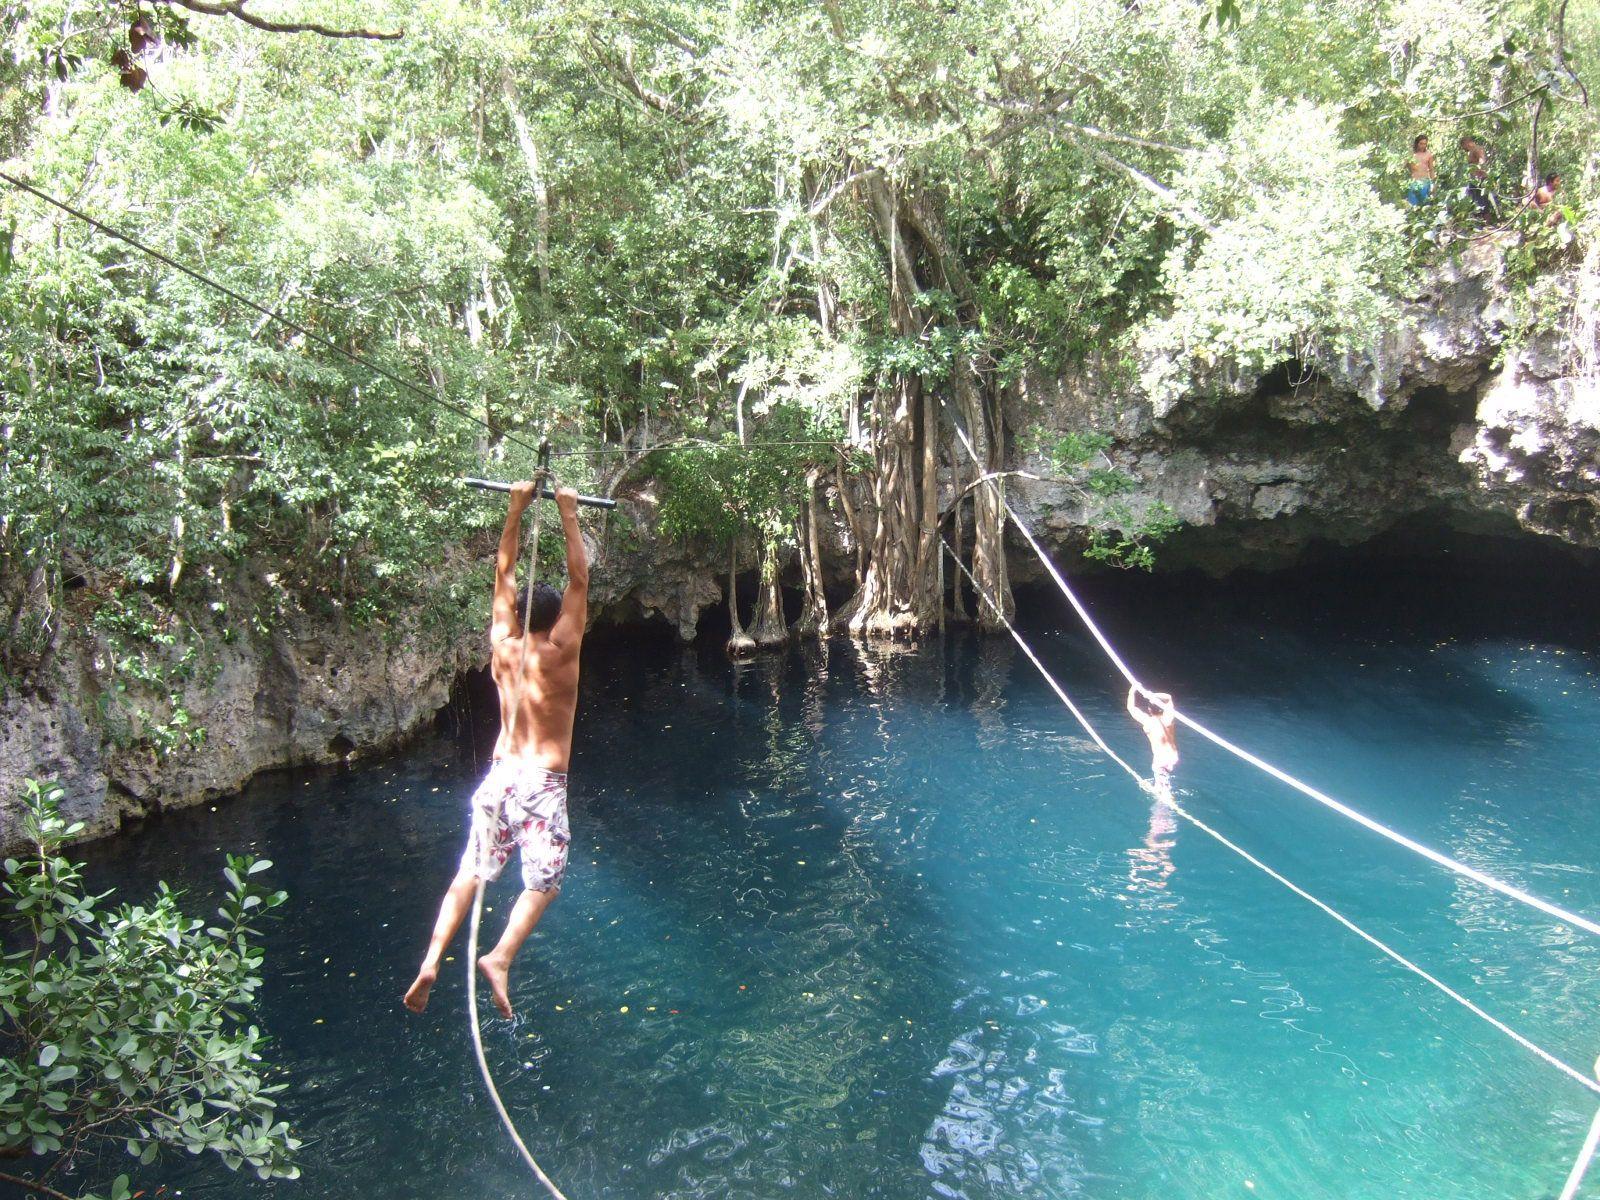 Ziplining Into Cenote Verde Lucerno Near Cancun Mexico Cancun Mexico Ziplining Cancun